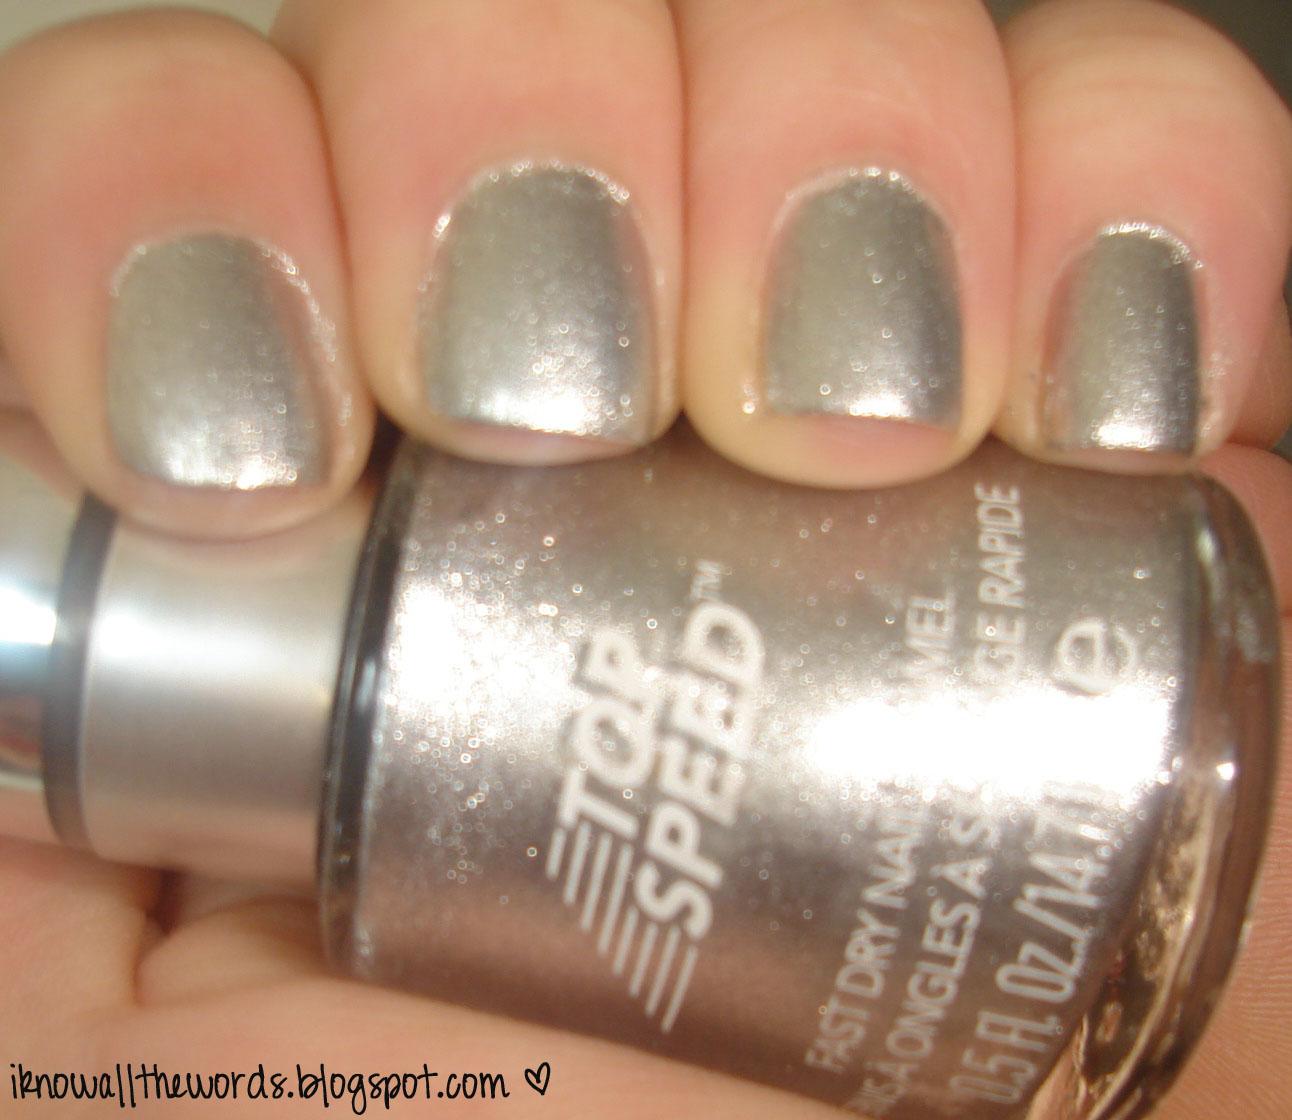 Metallic Nail Polish Silver: Review: Revlon Top Speed Nail Enamel In Metallic